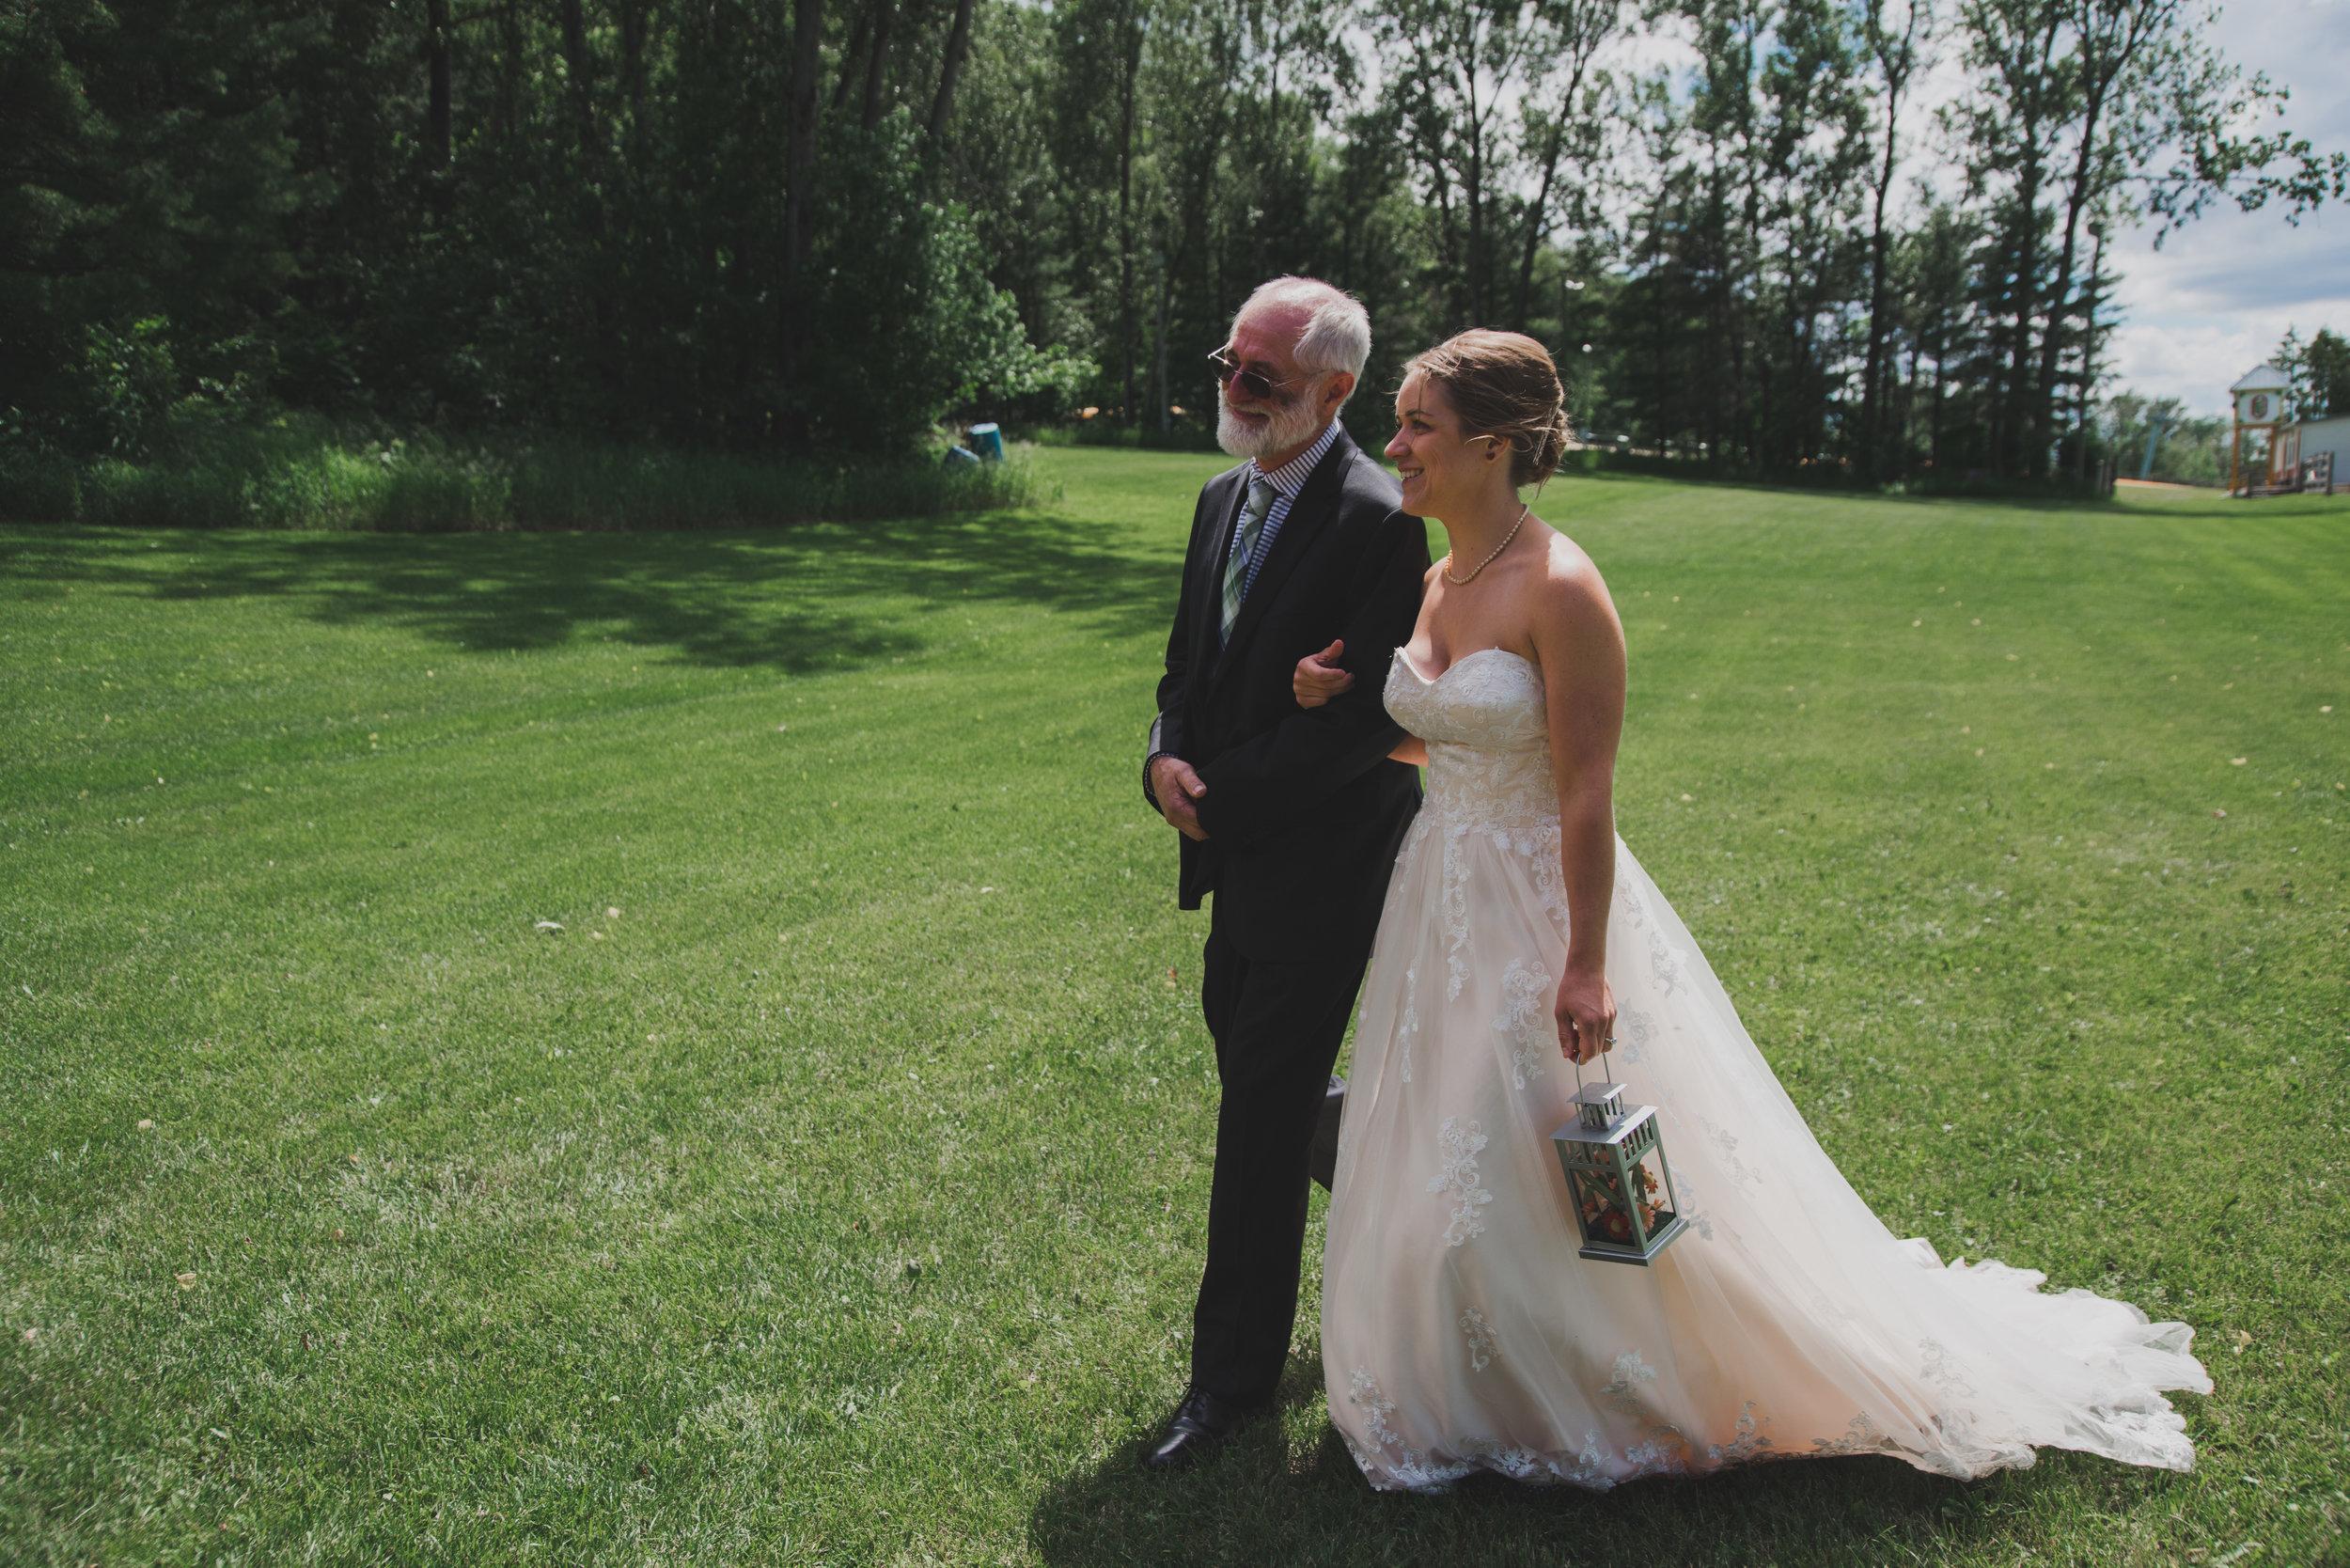 SheriCorey-Wedding-June242017-Ceremony-00035.jpg